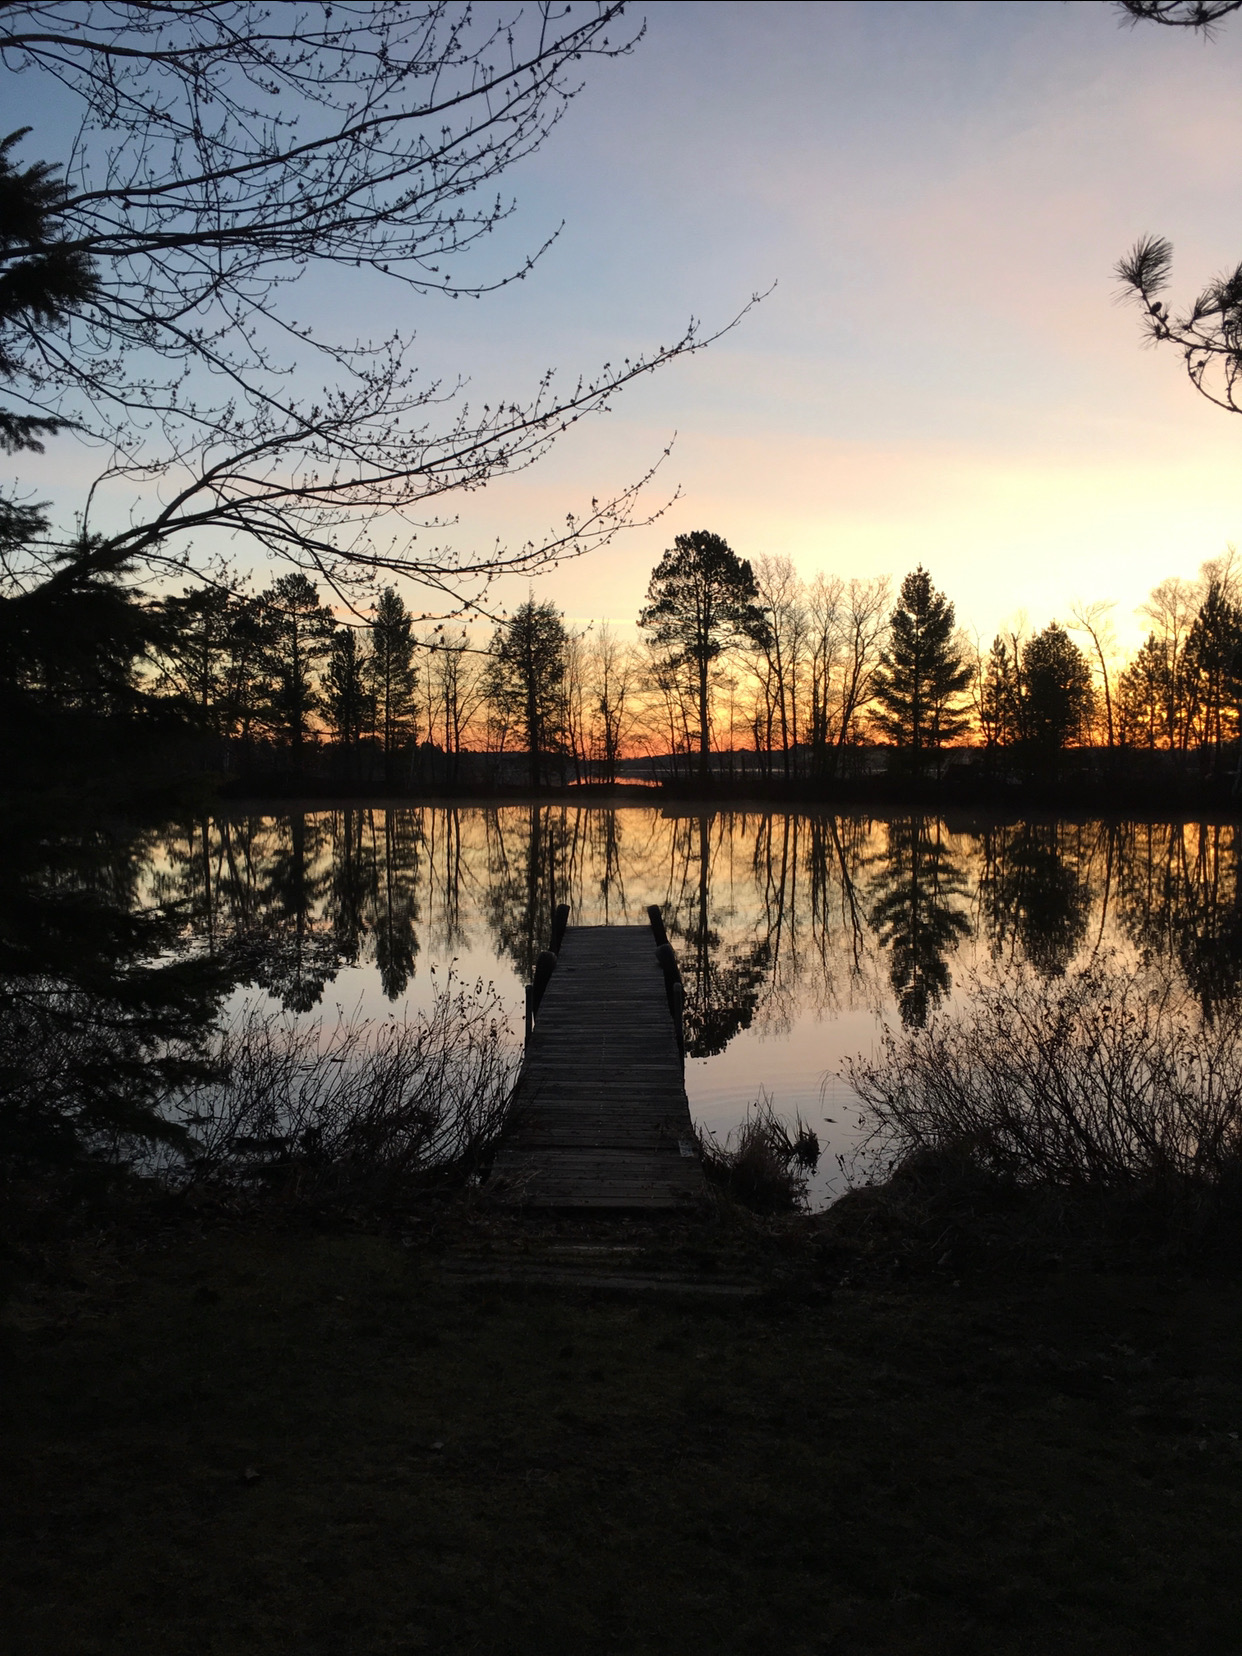 Sunrise on the Lanai